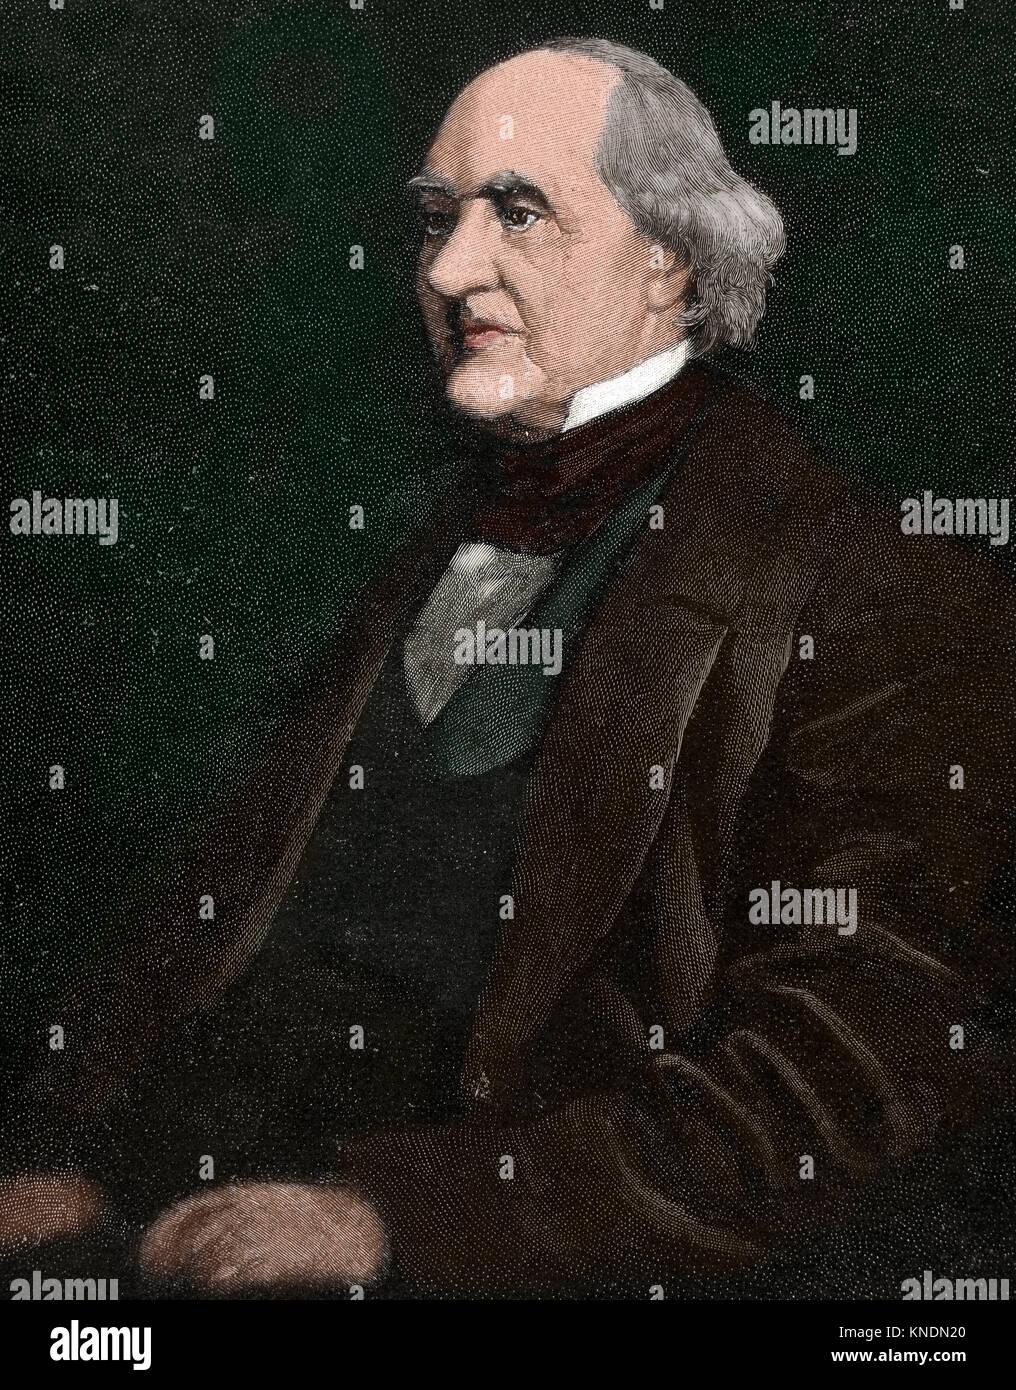 George Peabody (1795-1869). American-British financier and philanthrop. Portrait. Engraving. Colored. - Stock Image